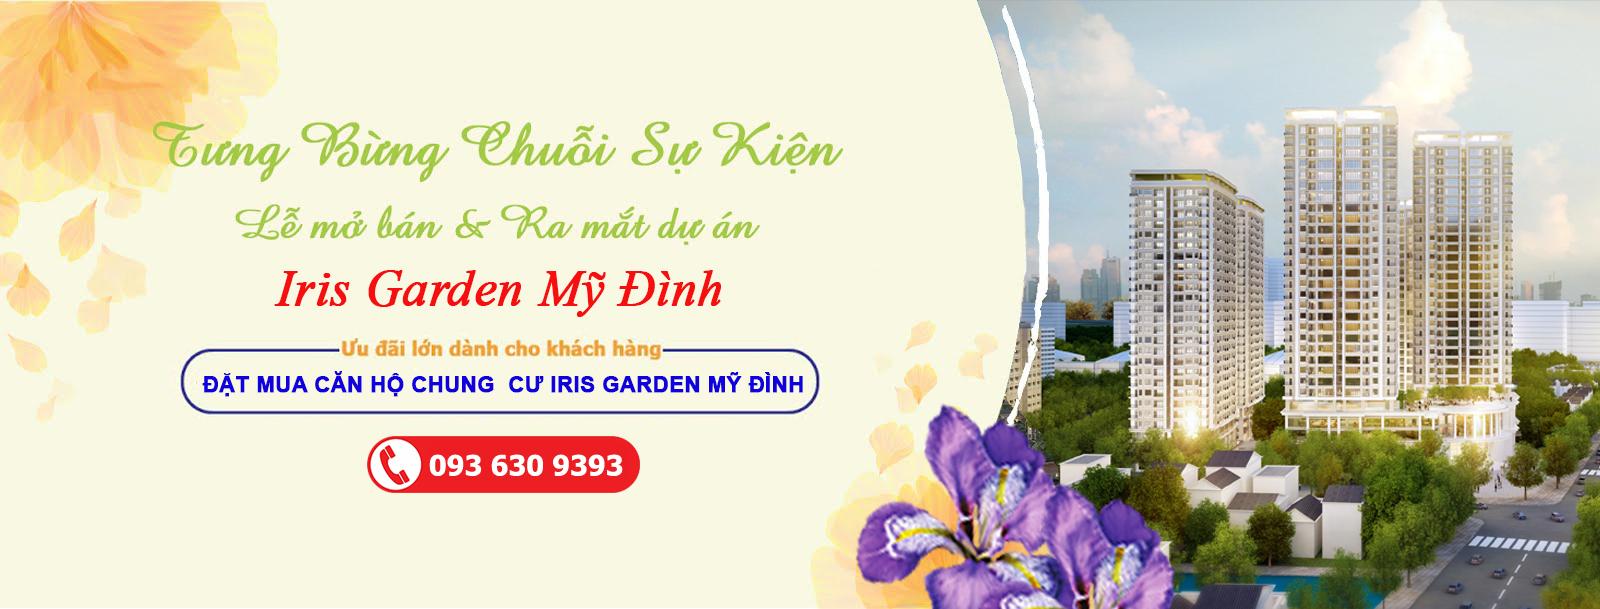 Chung cư iris garden trần hữu dực